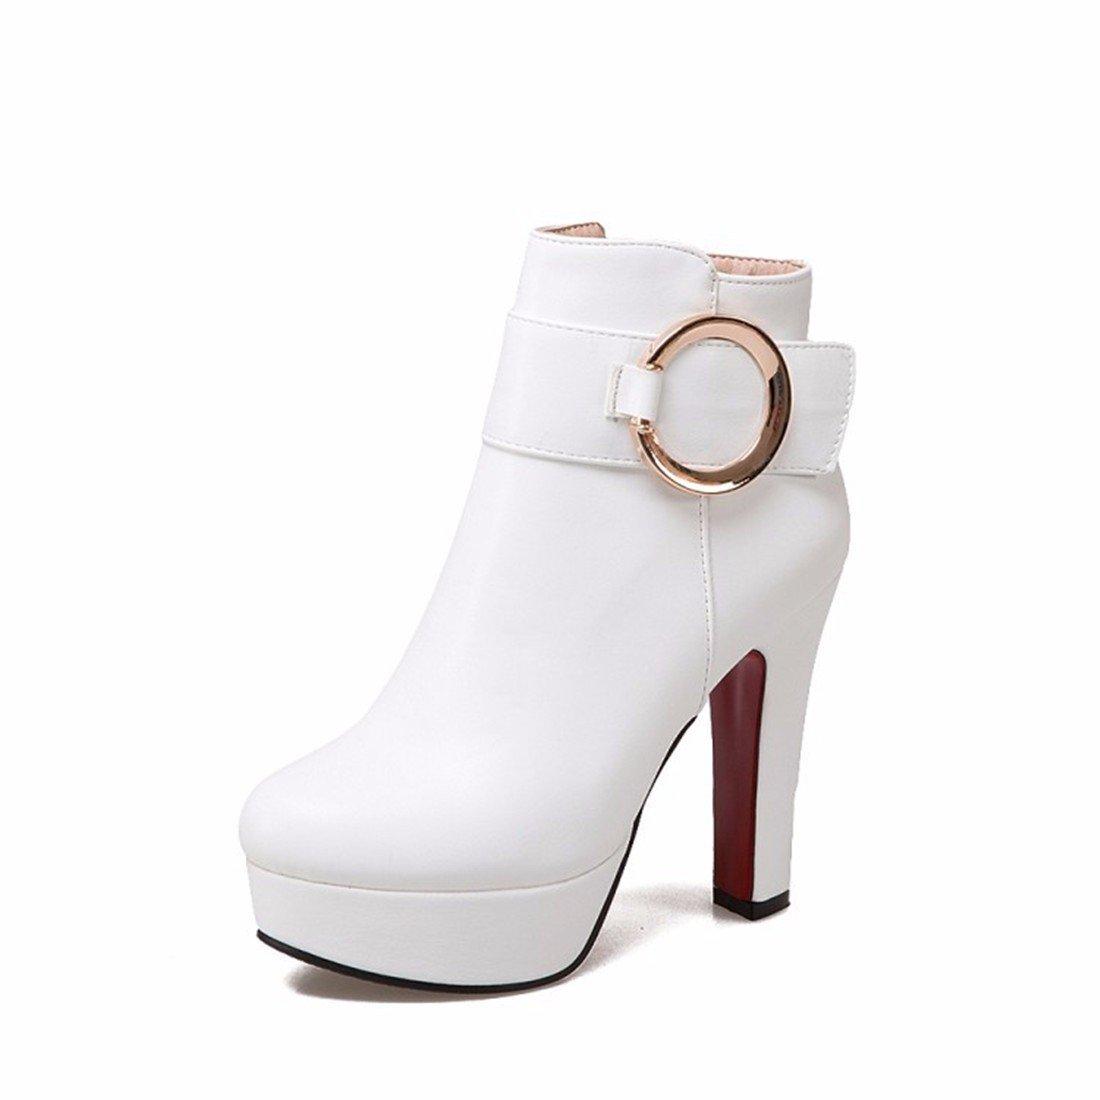 Hembra de otoñ o e Invierno los Zapatos de tacó n Alto Zapatos Botas Impermeables tamañ o